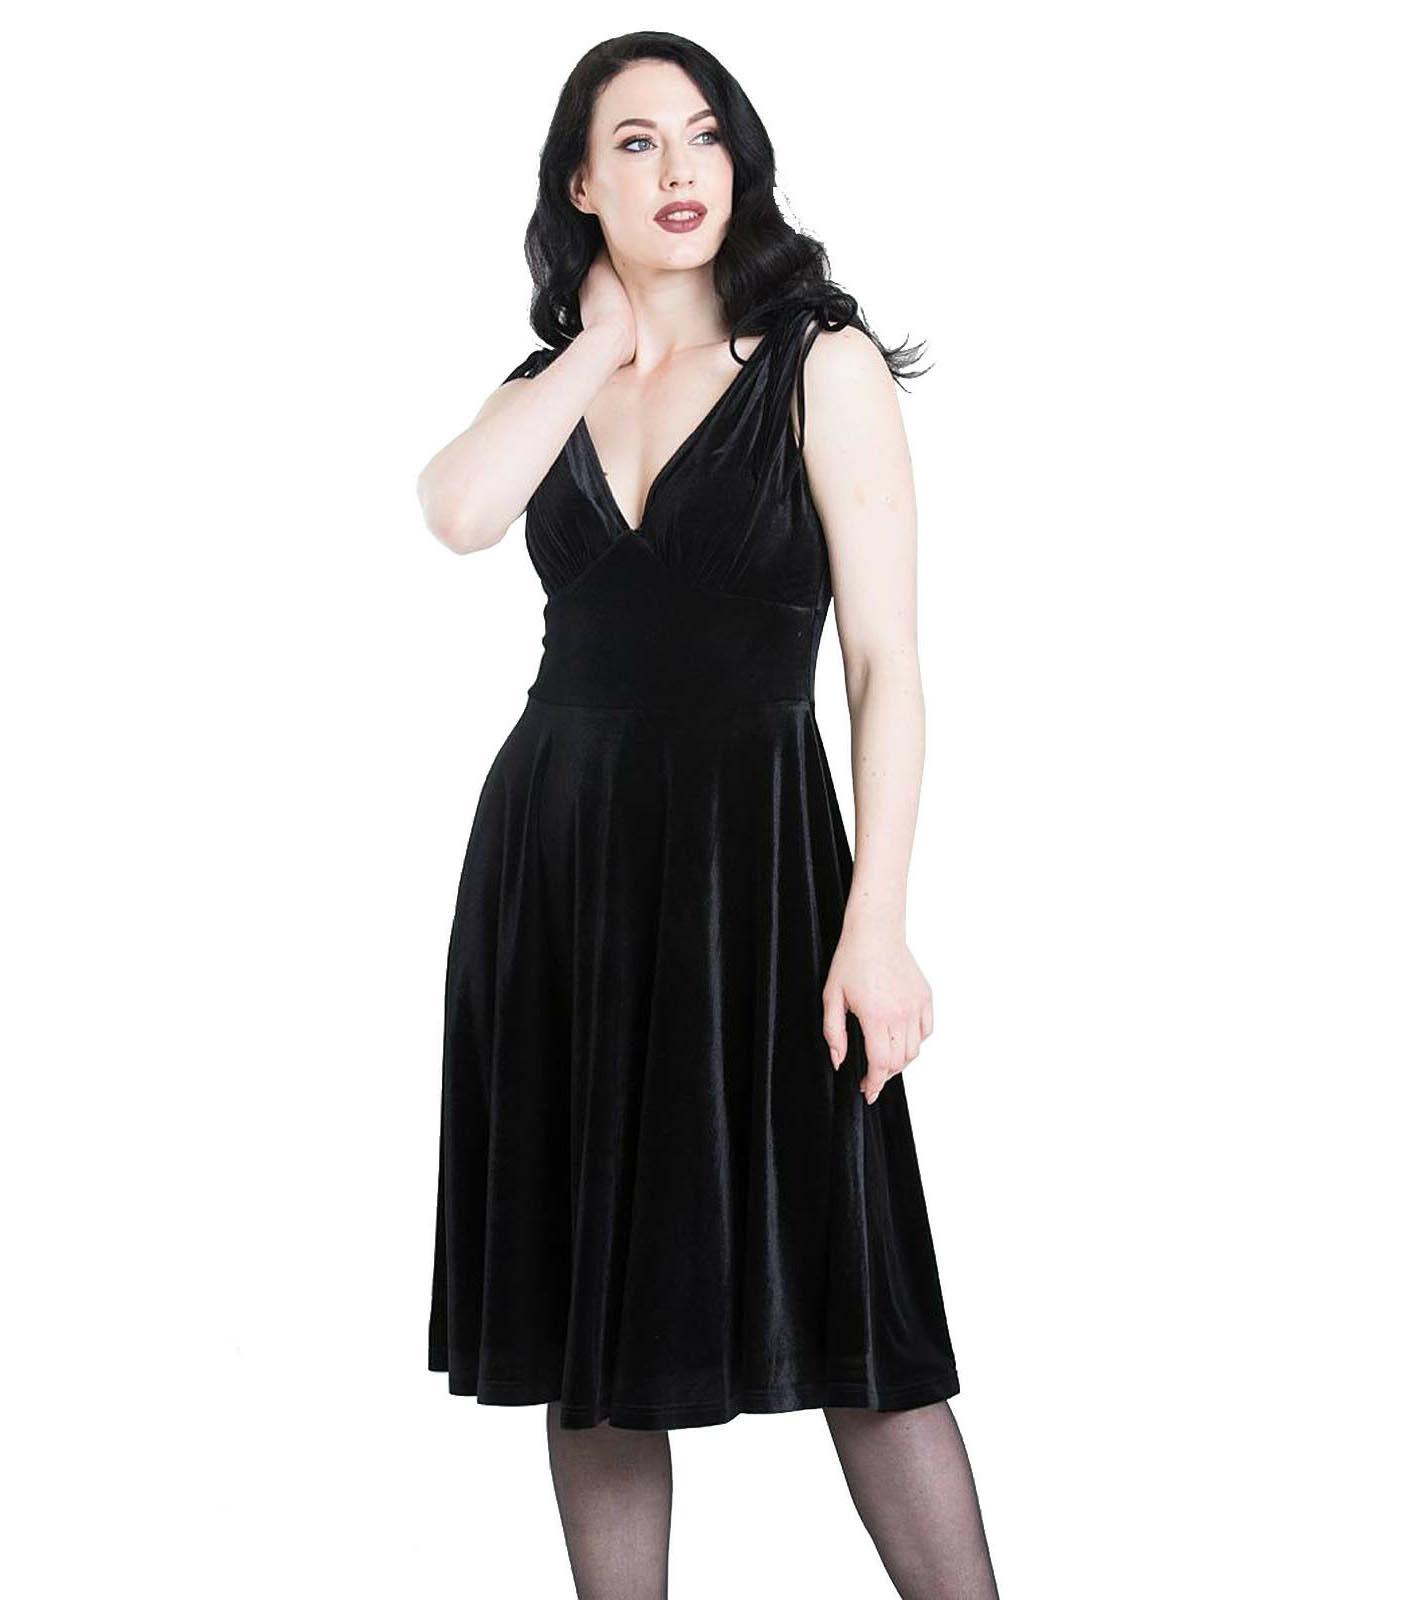 Hell-Bunny-40s-50s-Elegant-Pin-Up-Dress-MELINA-Crushed-Velvet-Black-All-Sizes thumbnail 15